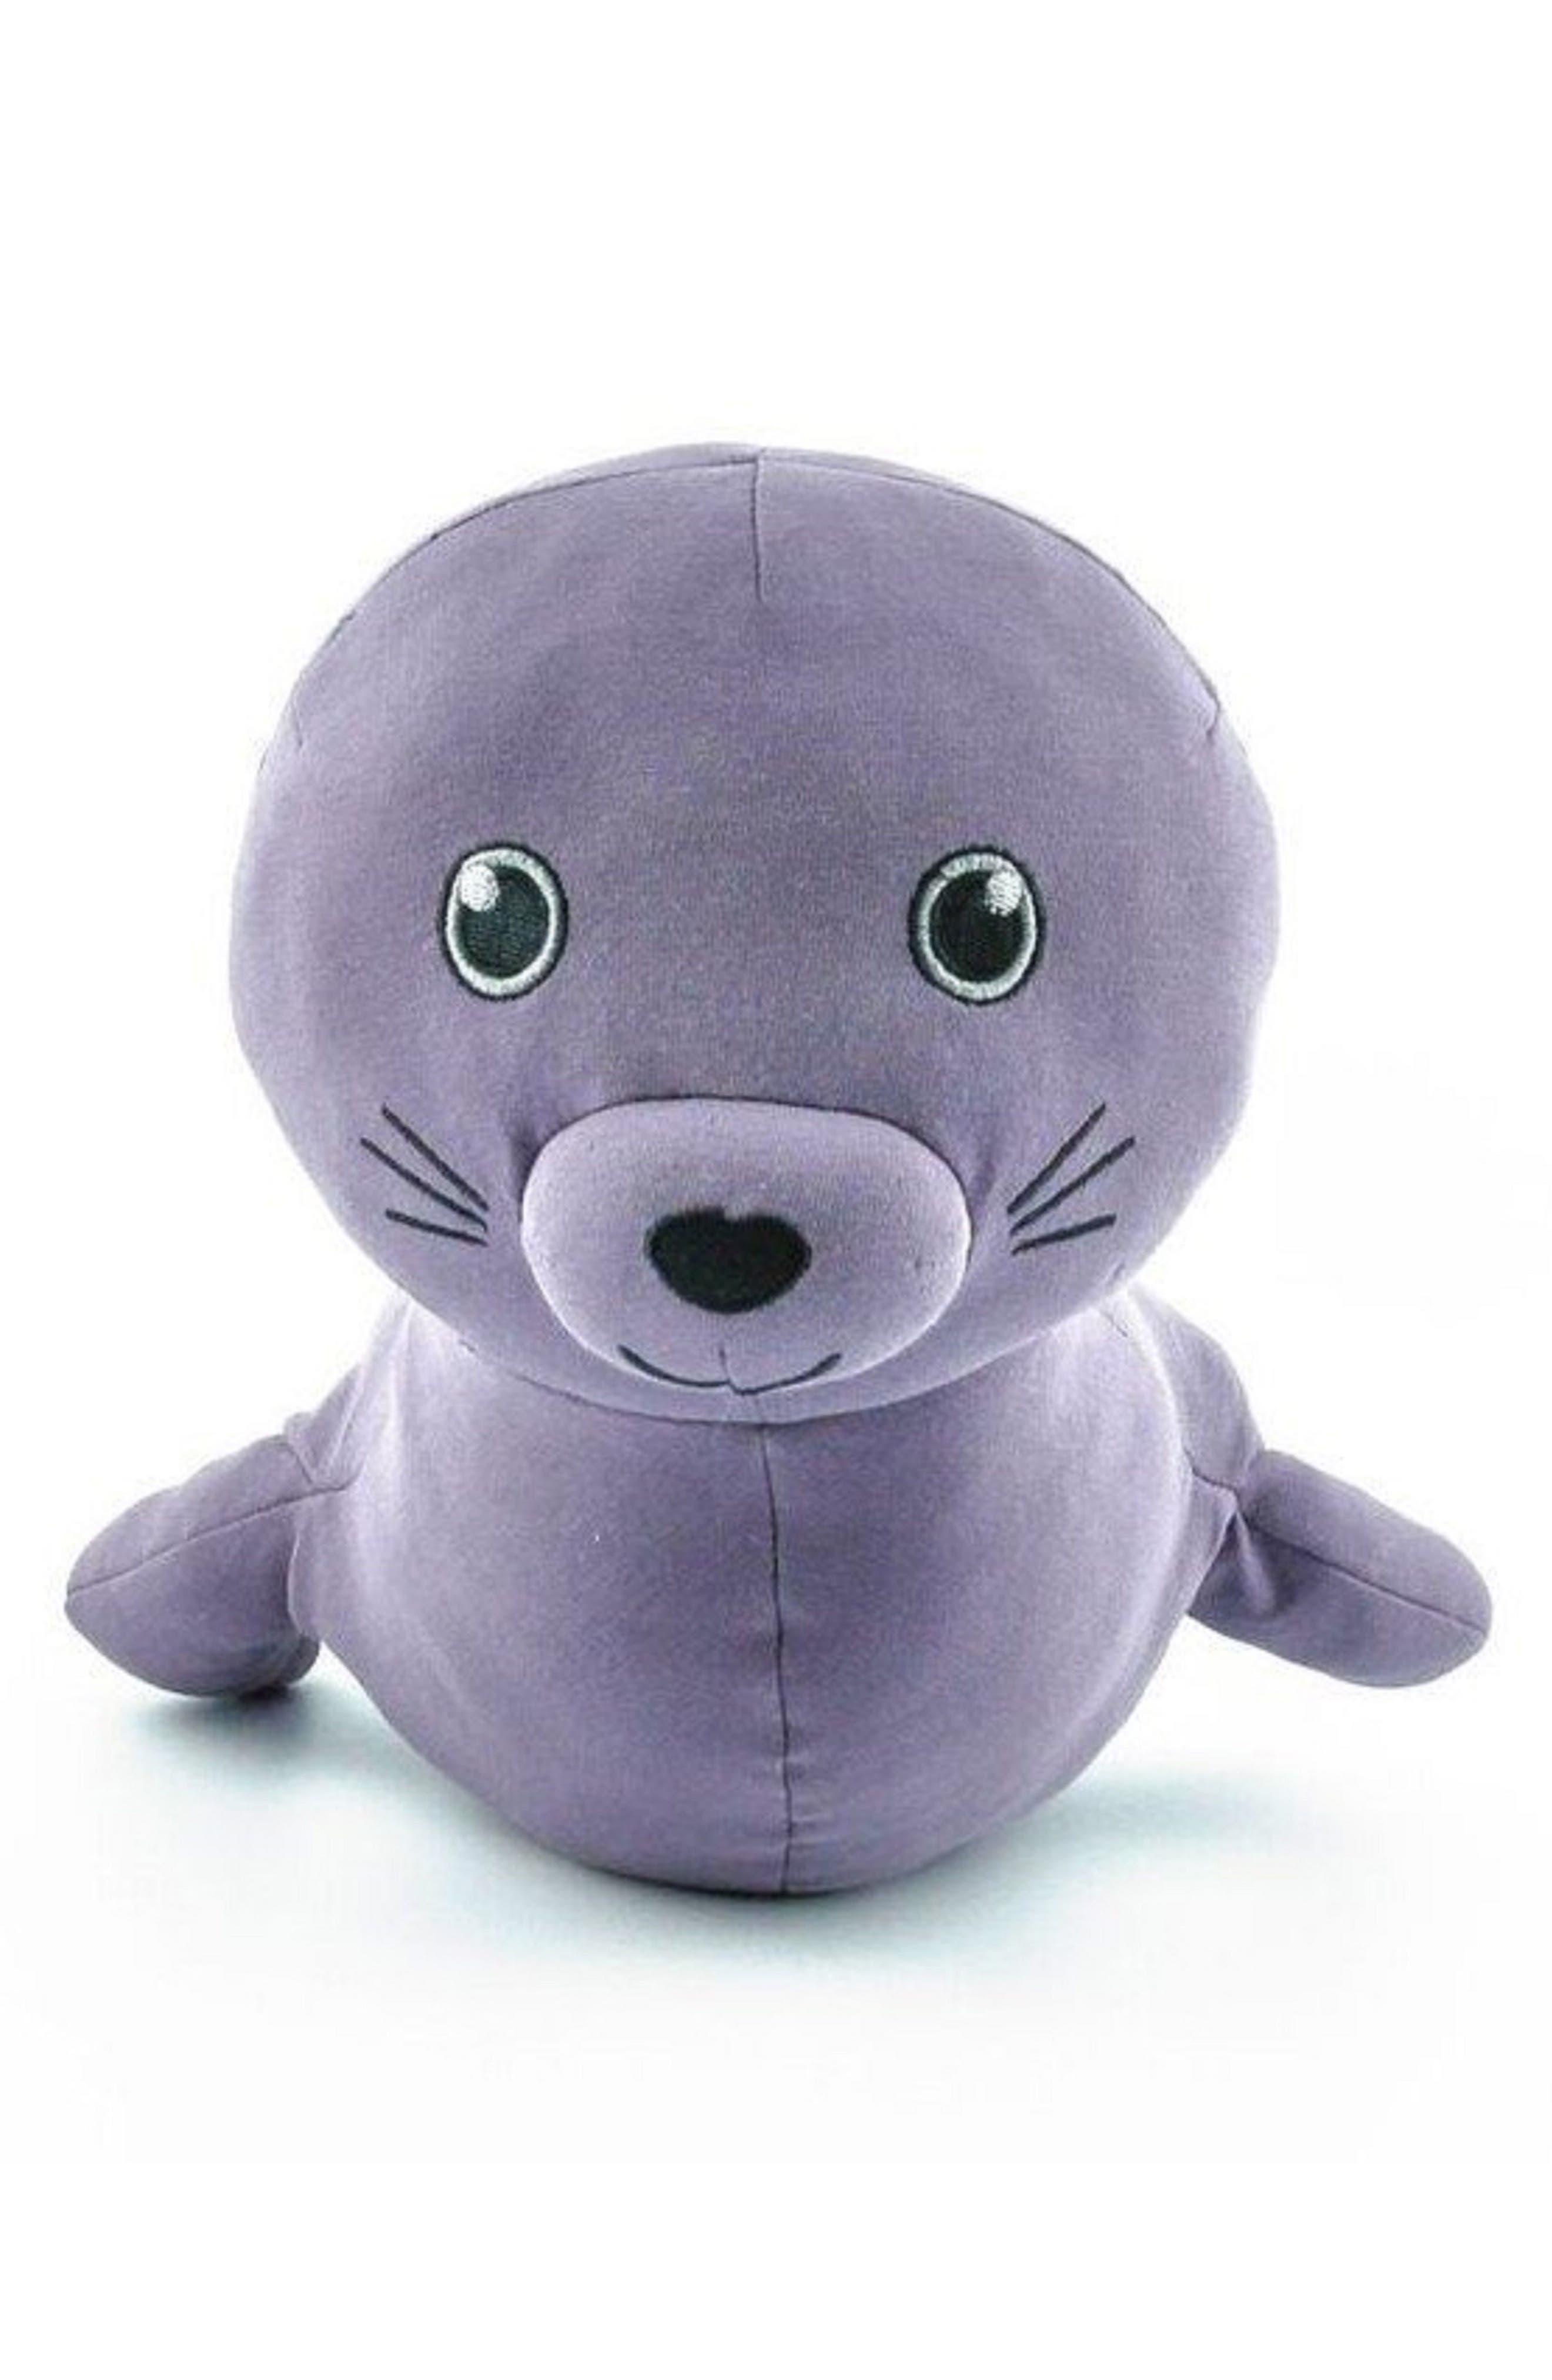 Elly Lu Organics Makana Monk Seal Stuffed Animal